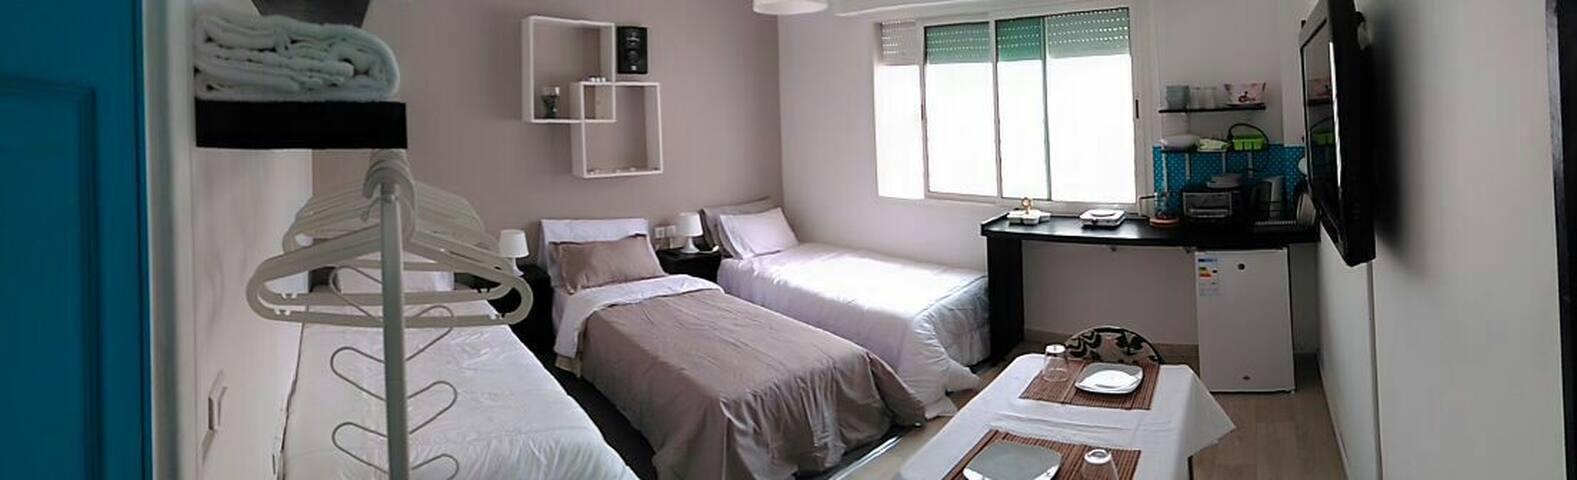 Jolie chambre au coeur de Rabat - Rabat - Leilighet